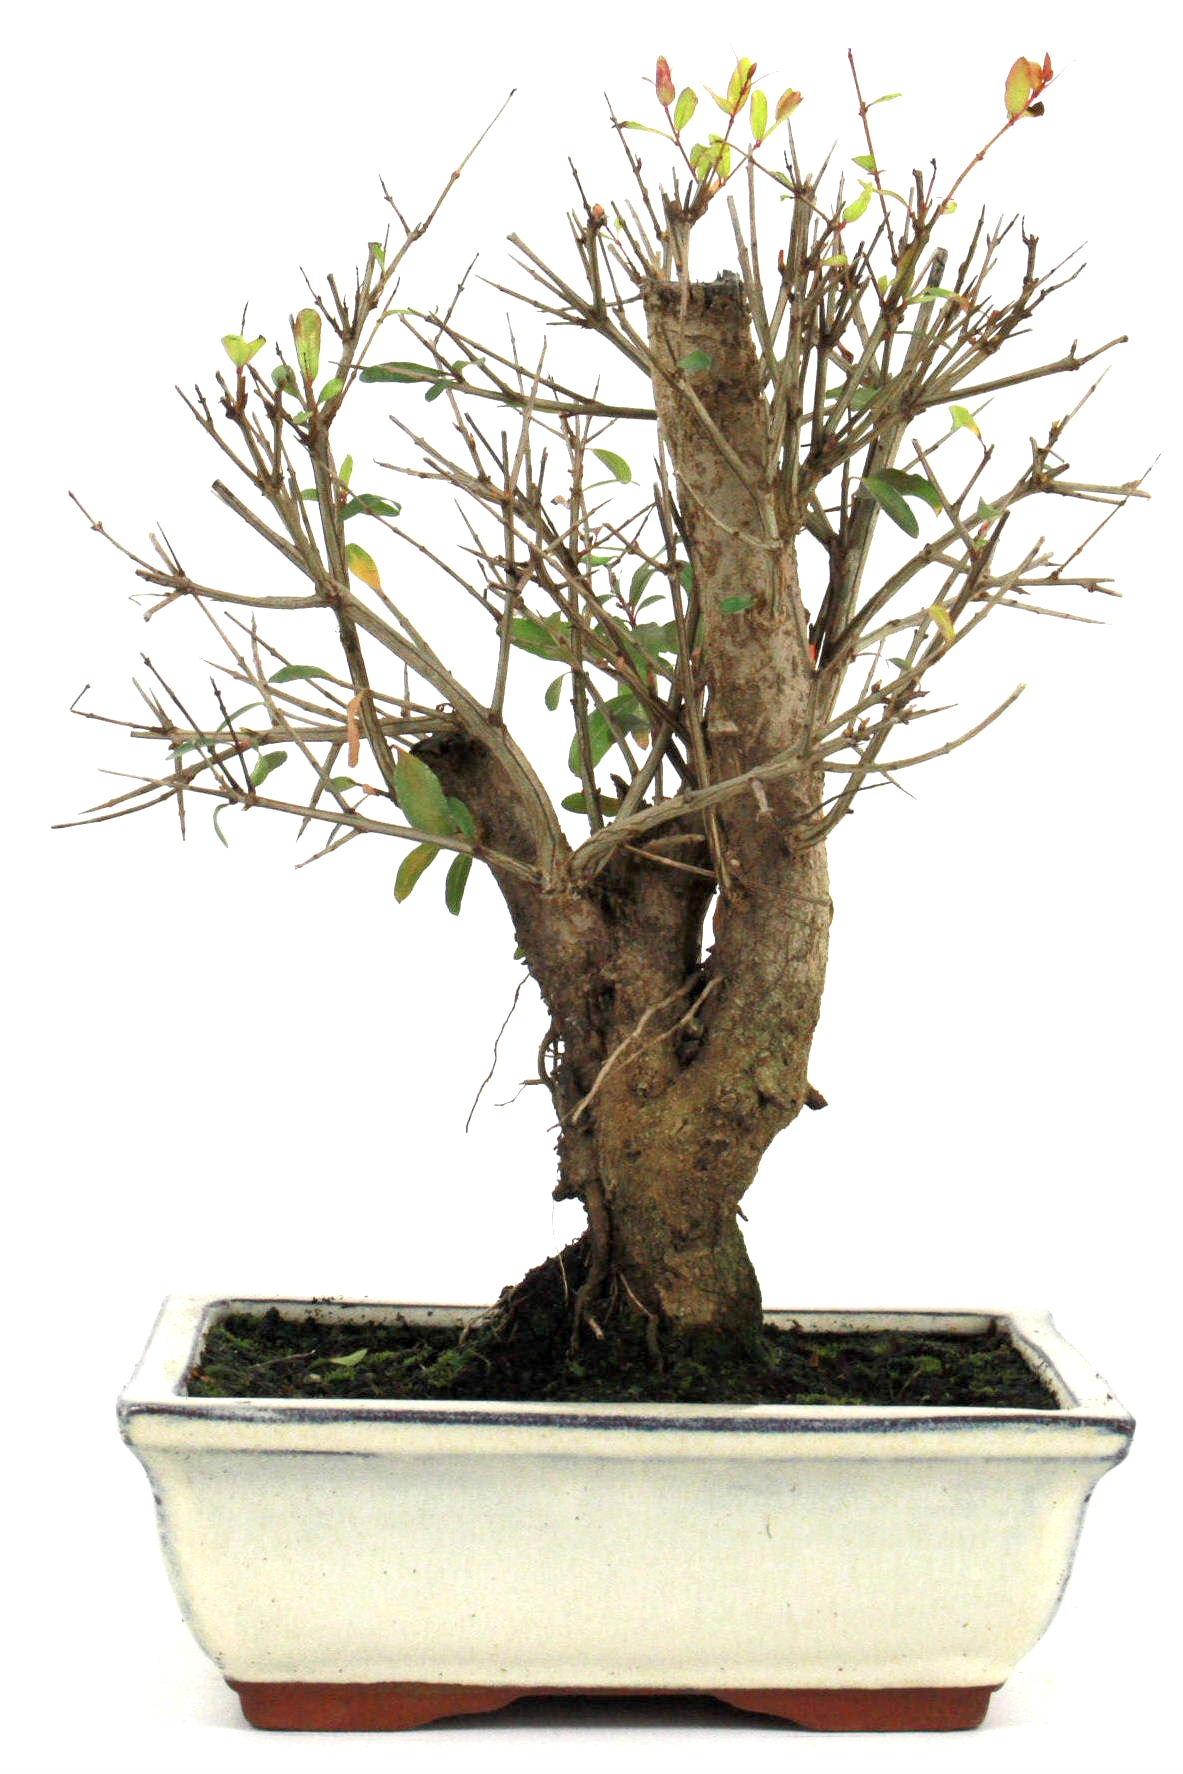 bonsai granatapfel 35 40 cm 1916 bei oyaki bonsai kaufen. Black Bedroom Furniture Sets. Home Design Ideas